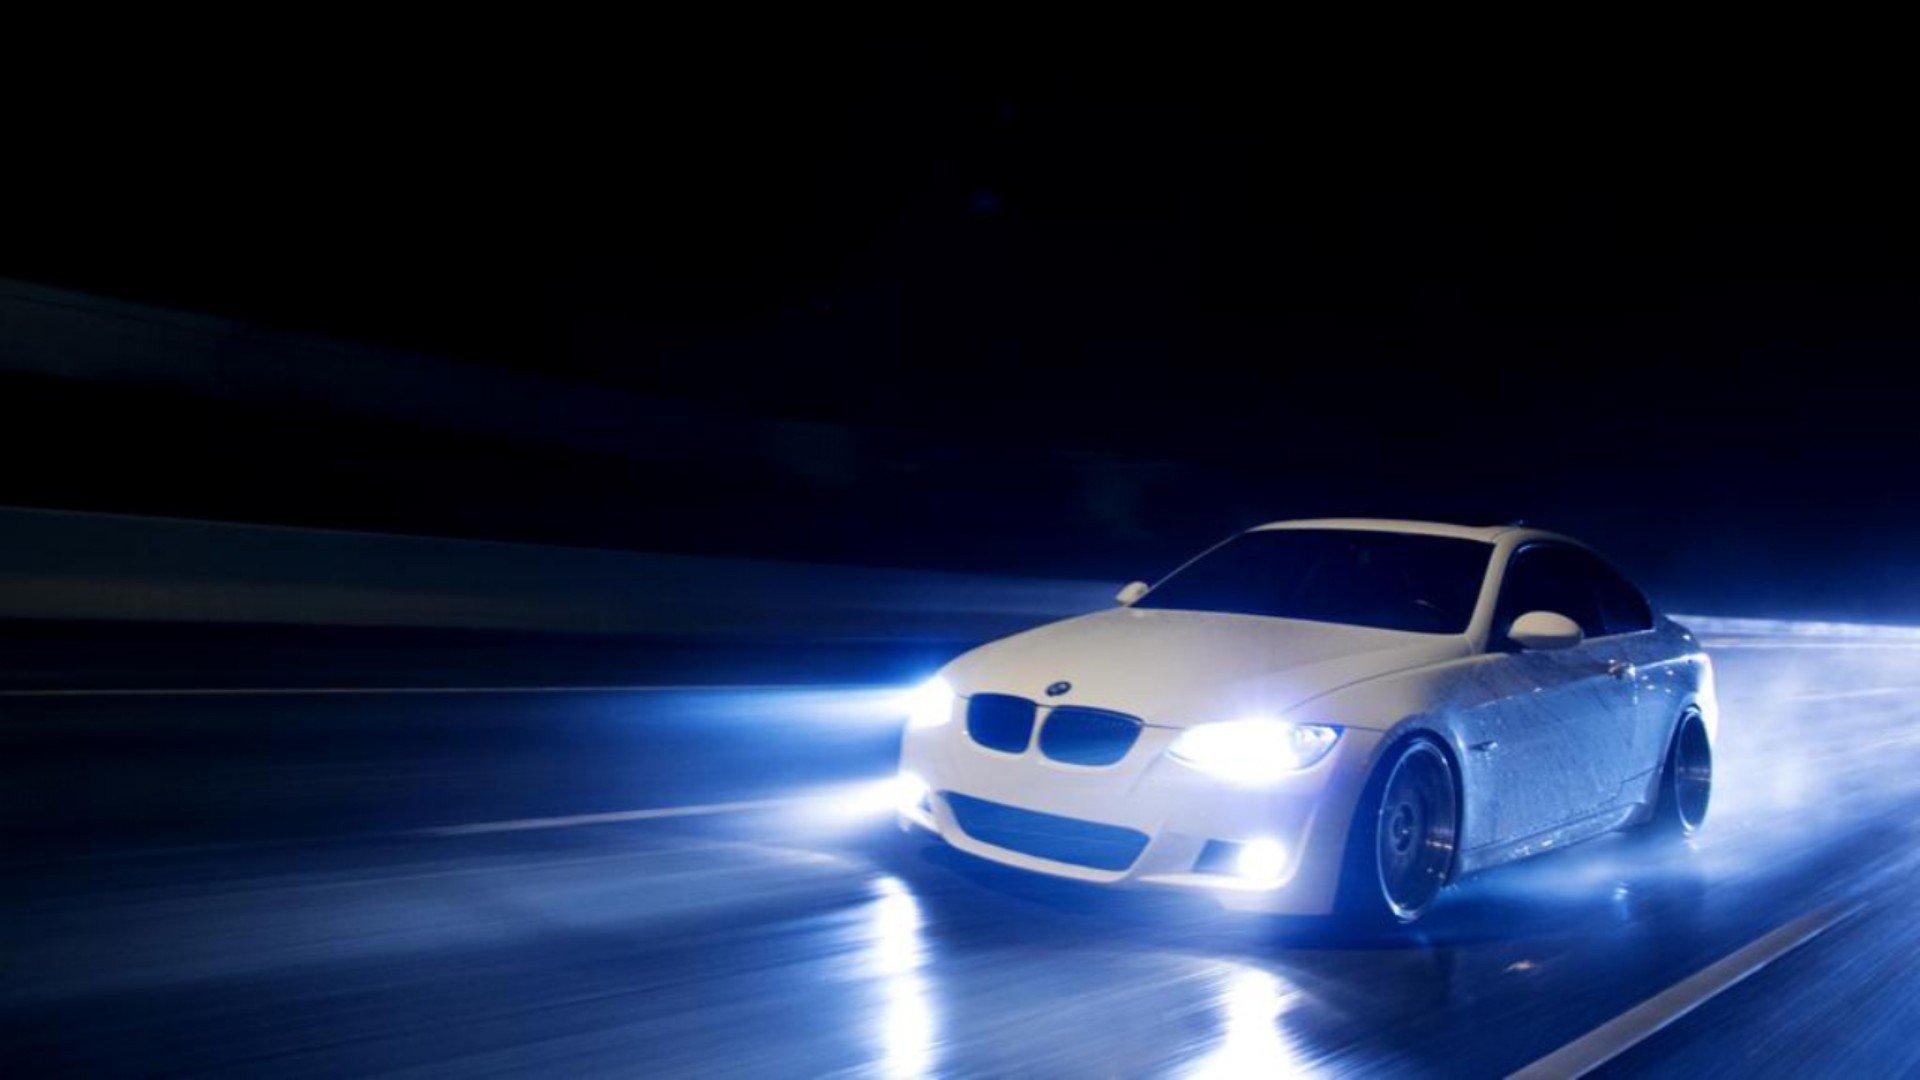 Bmw Night Lights Rain Cars Bmw E92 Wallpaper 1920x1080 295630